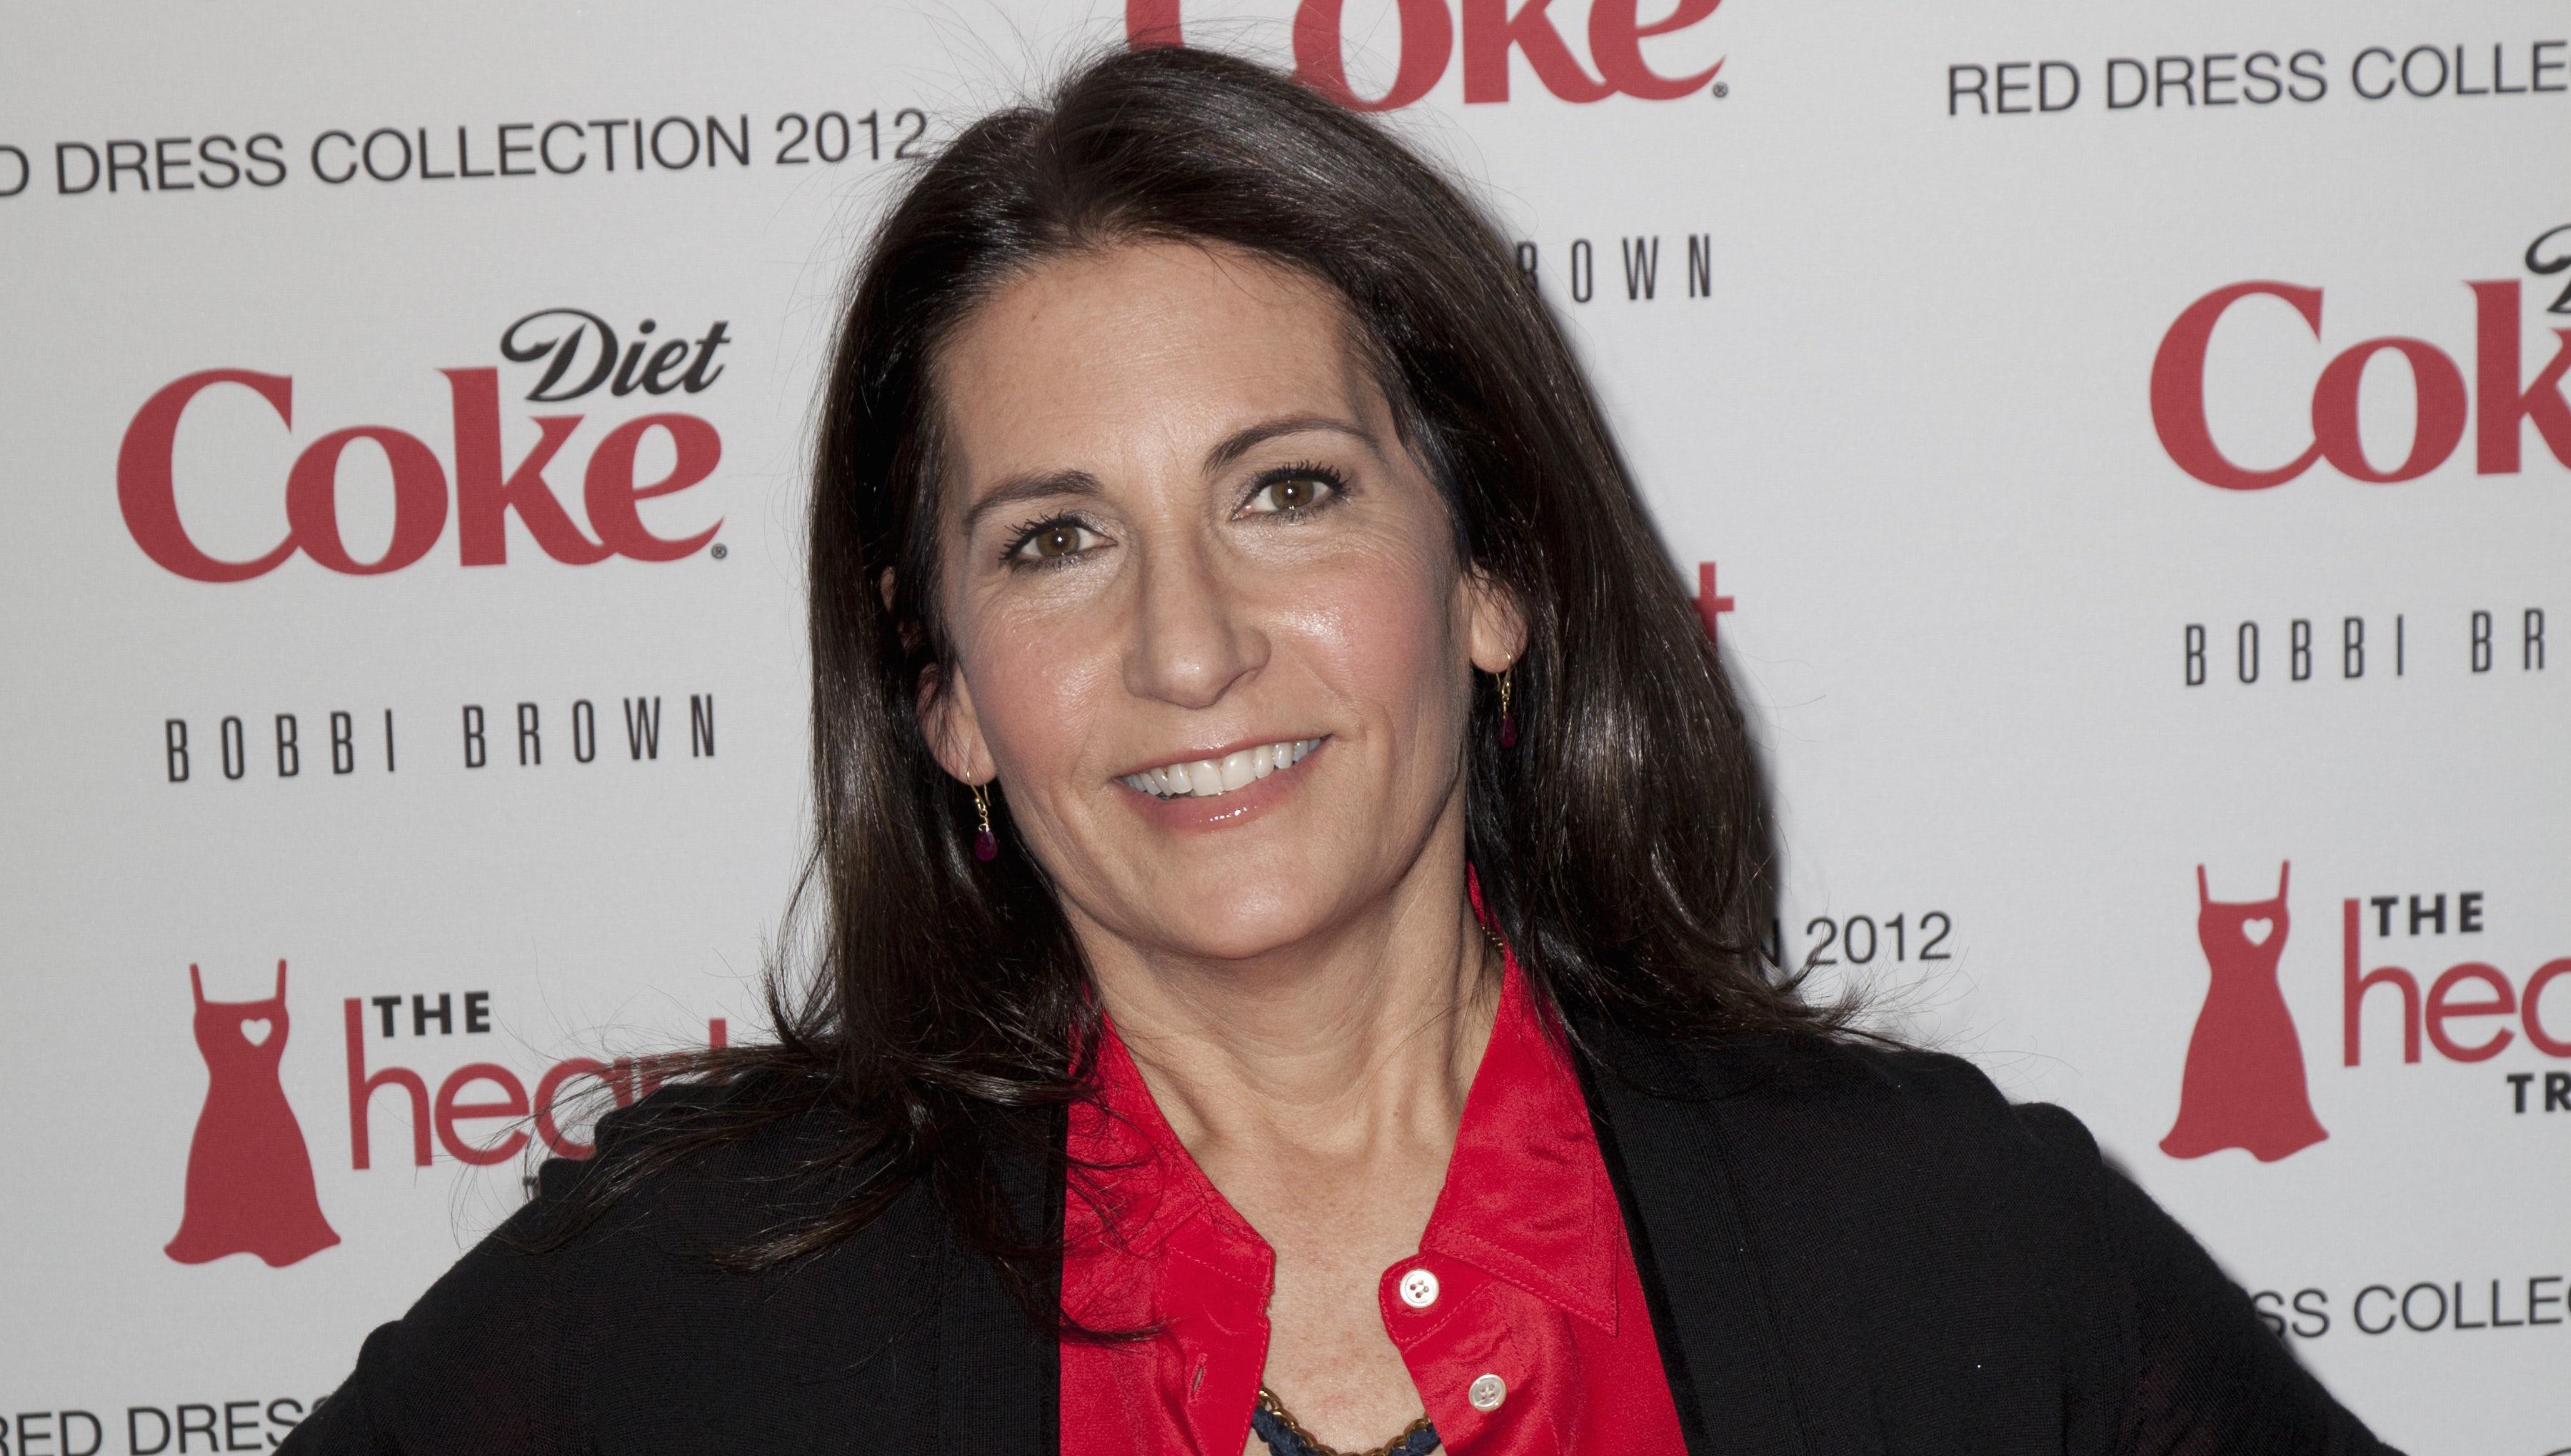 Power Moves | Bobbi Brown Leaves Eponymous Brand, Salvatore Ferragamo Appoints CFO